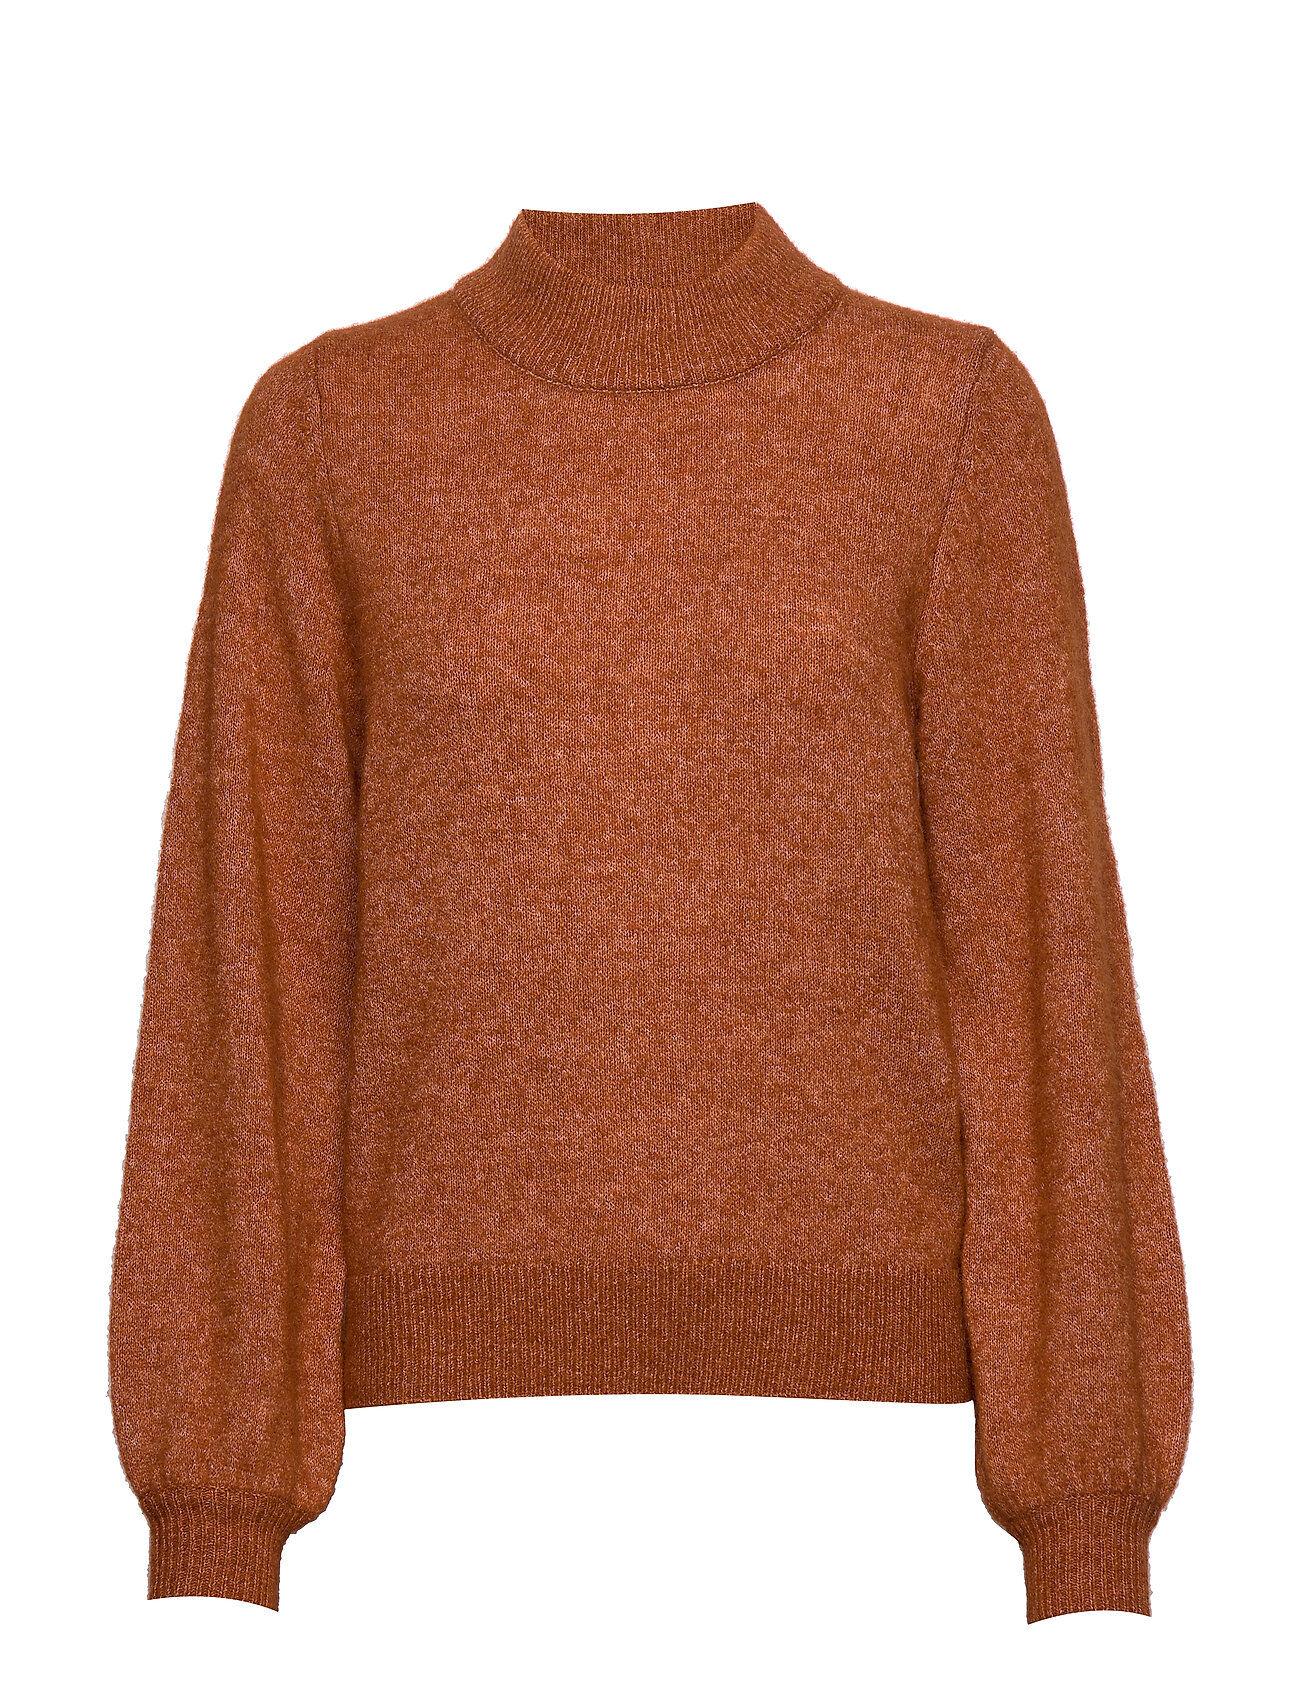 Selected Femme Slfanna Ls X-Mas Knit O-Neck B Kilpikonnakaulus Poolopaita Oranssi Selected Femme